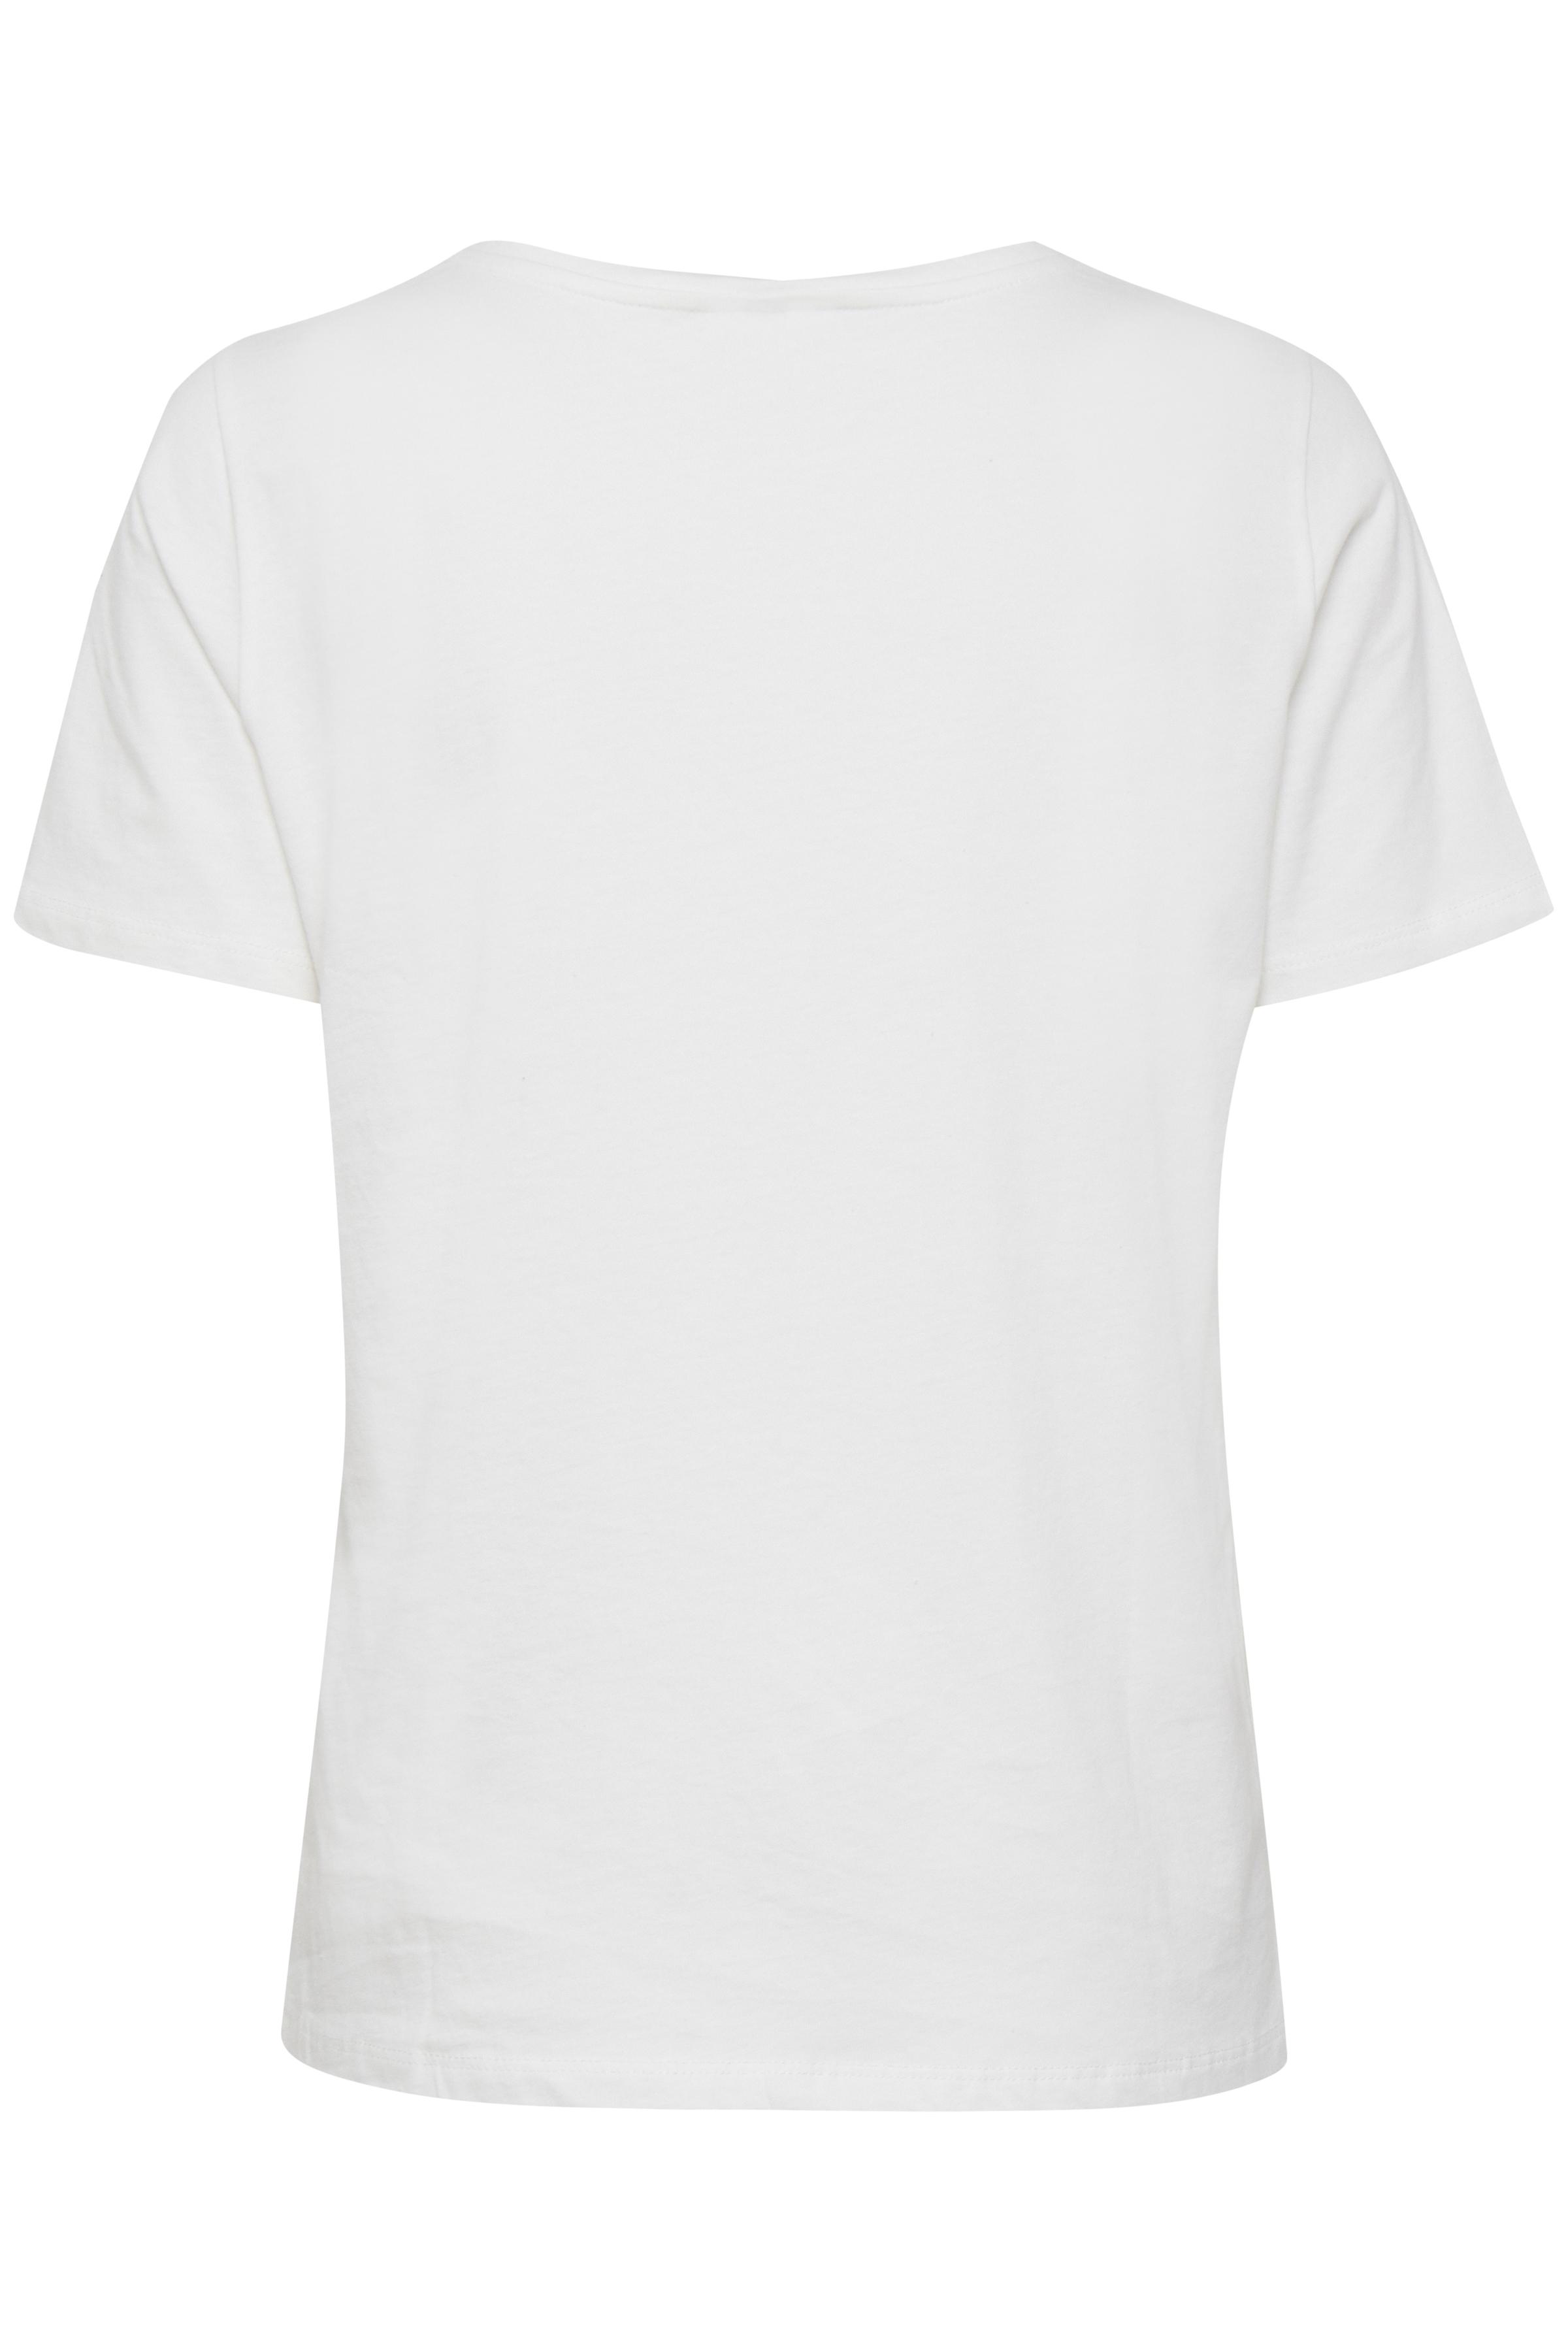 Soft Cream T-Shirt – Køb Soft Cream T-Shirt fra str. XS-XXL her